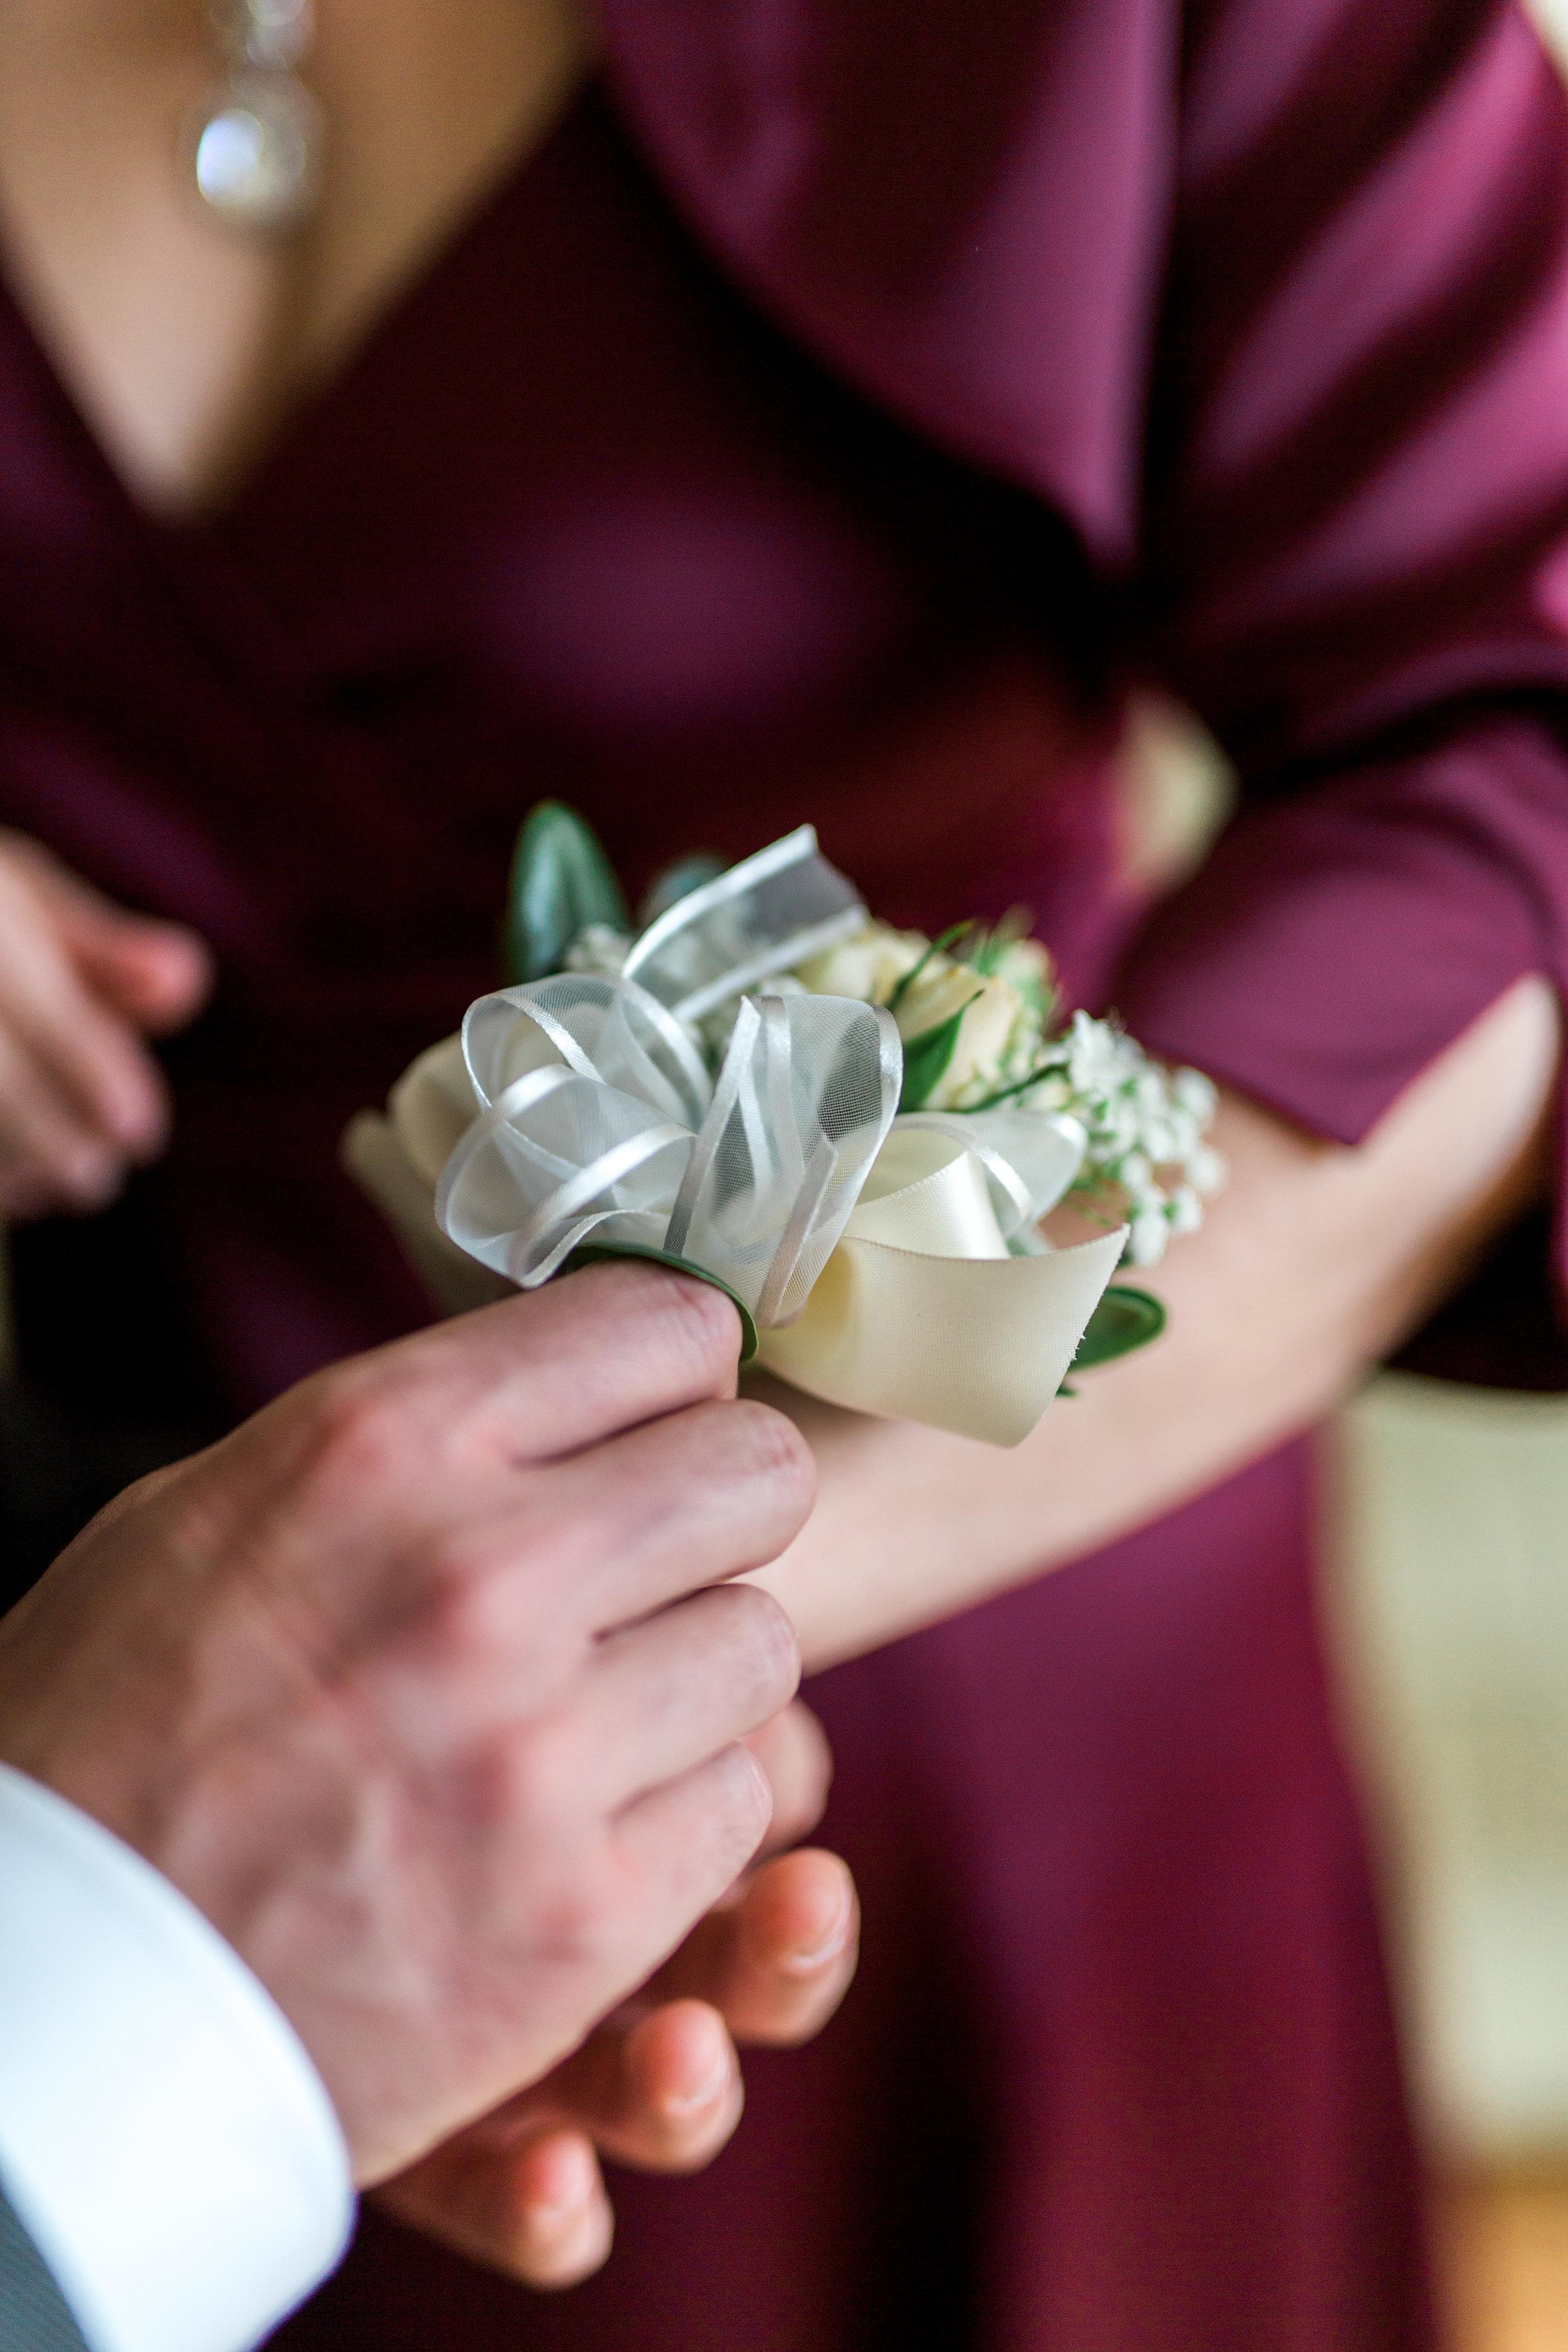 Amir-Golbazi-Danielle-Giroux-Photography_Toronto-Wedding_Cedarwood_Rachel-Paul_038.jpg